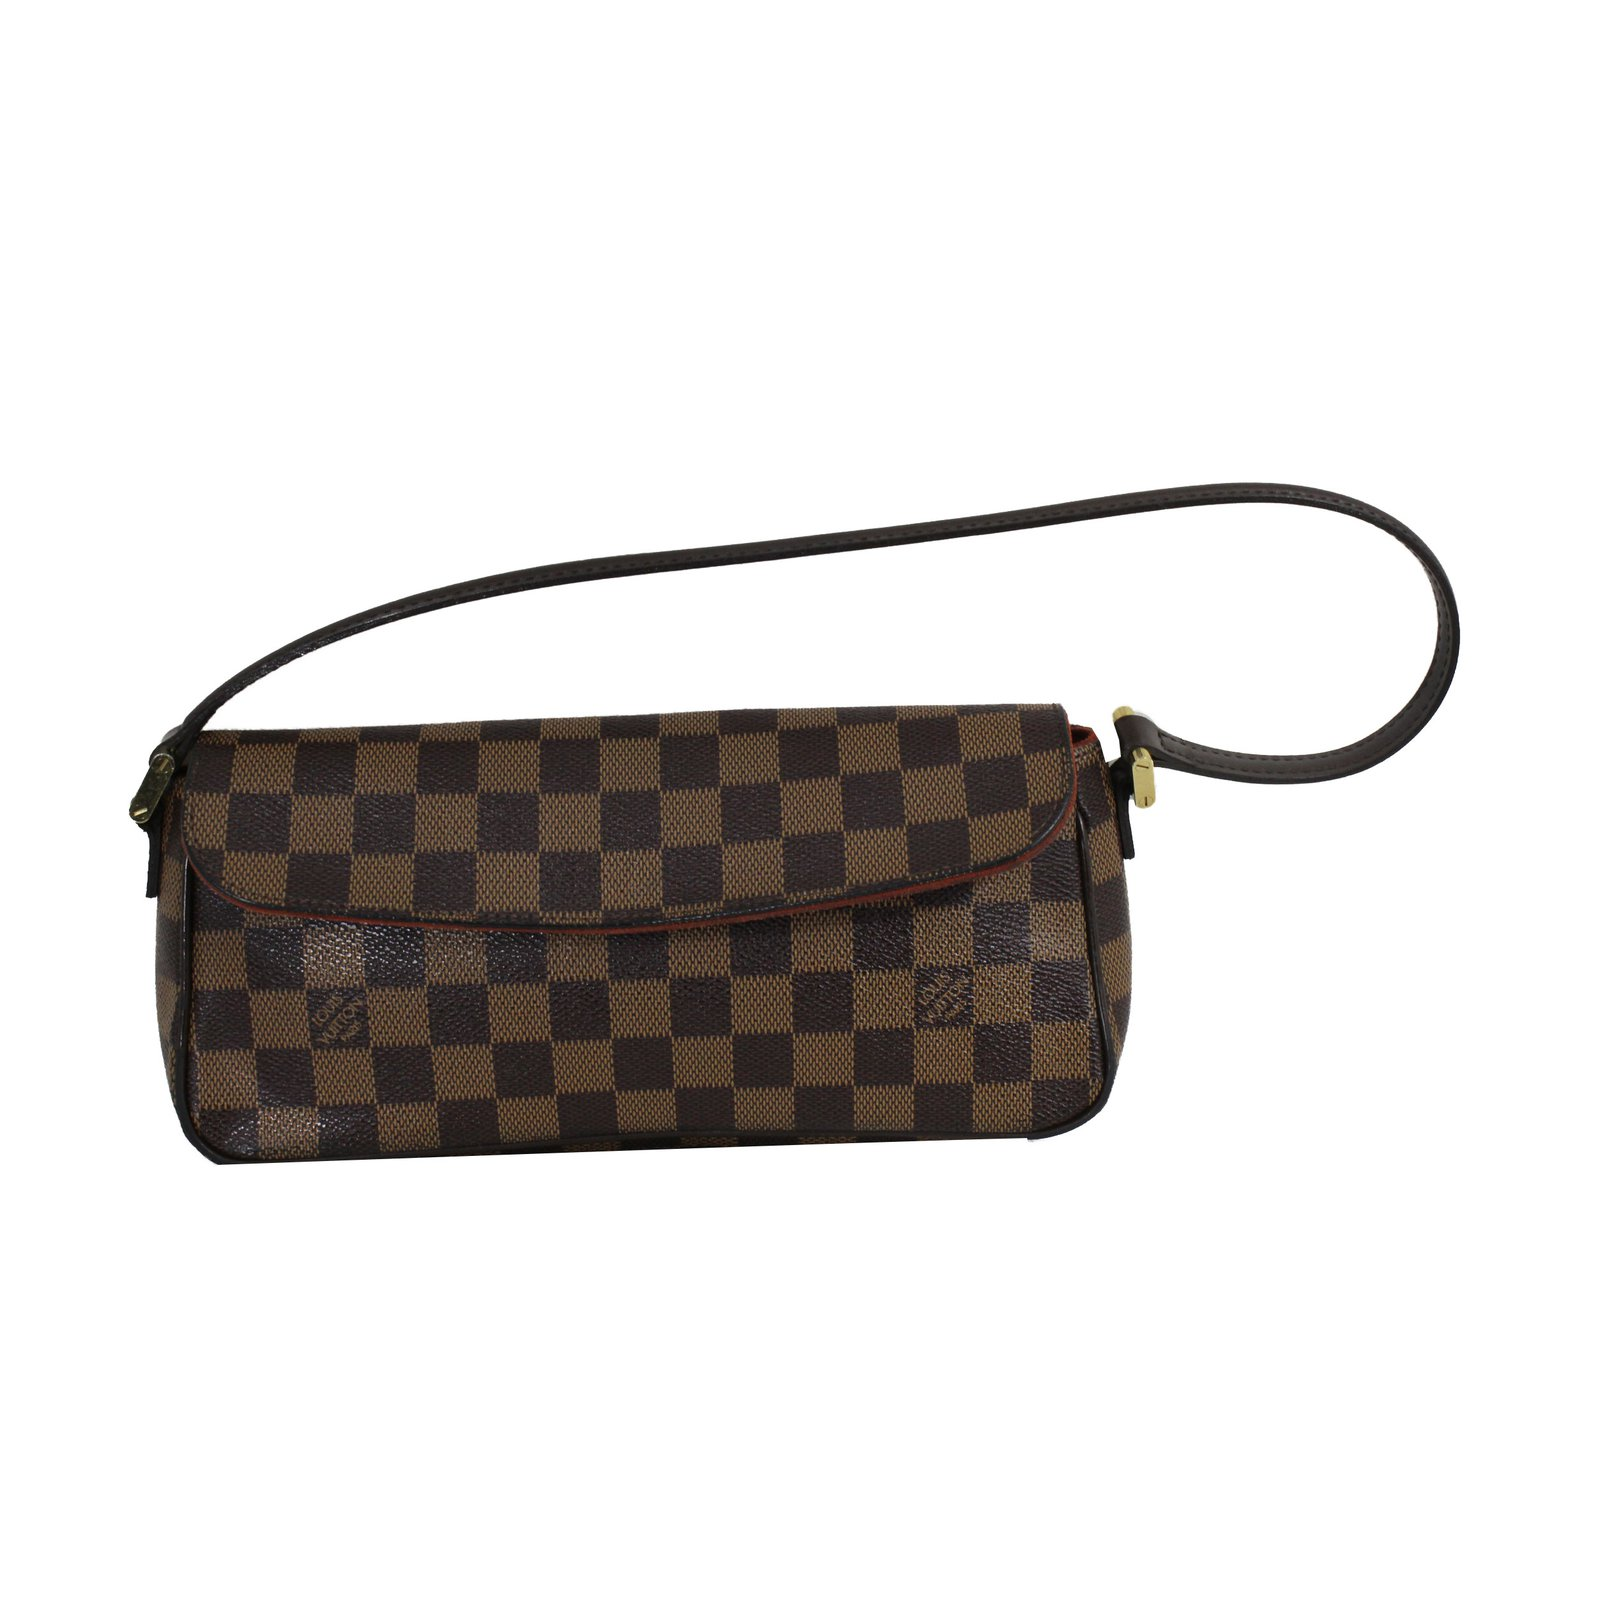 91d08bba7049 Louis Vuitton Clutch bags Clutch bags Leather Brown ref.51030 - Joli ...